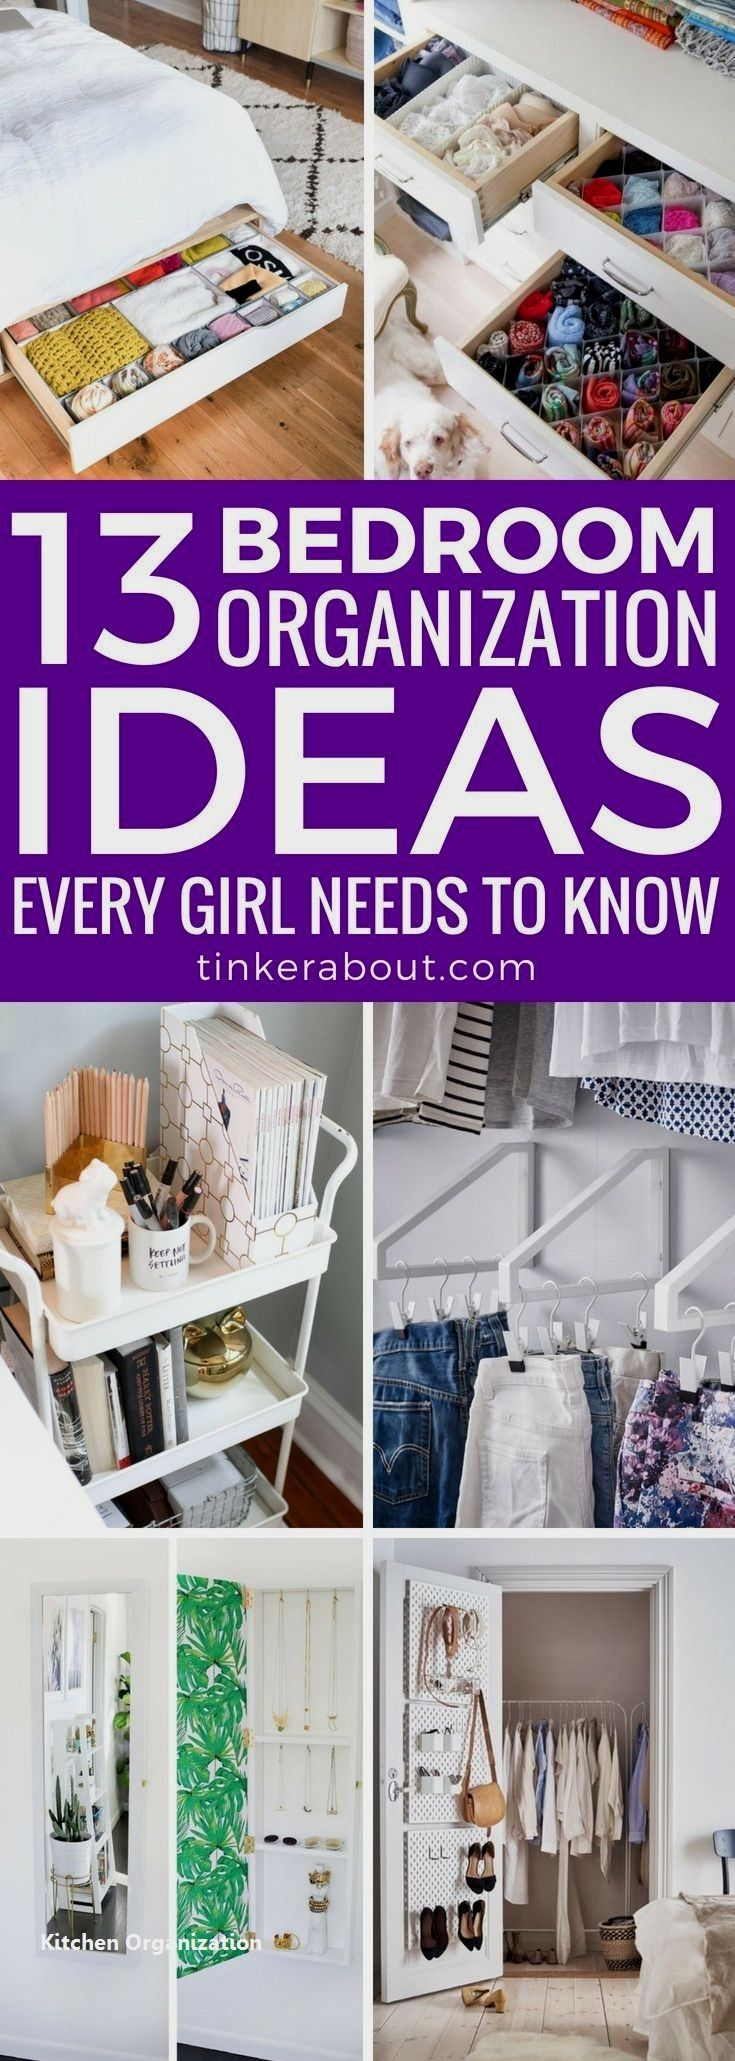 15 Smart Diy Organizing Ideas For Small Kitchen 2 Diy Storage Ideas For Small Bedrooms Small Room Organization Bedroom Organization Diy Bedroom room organization ideas